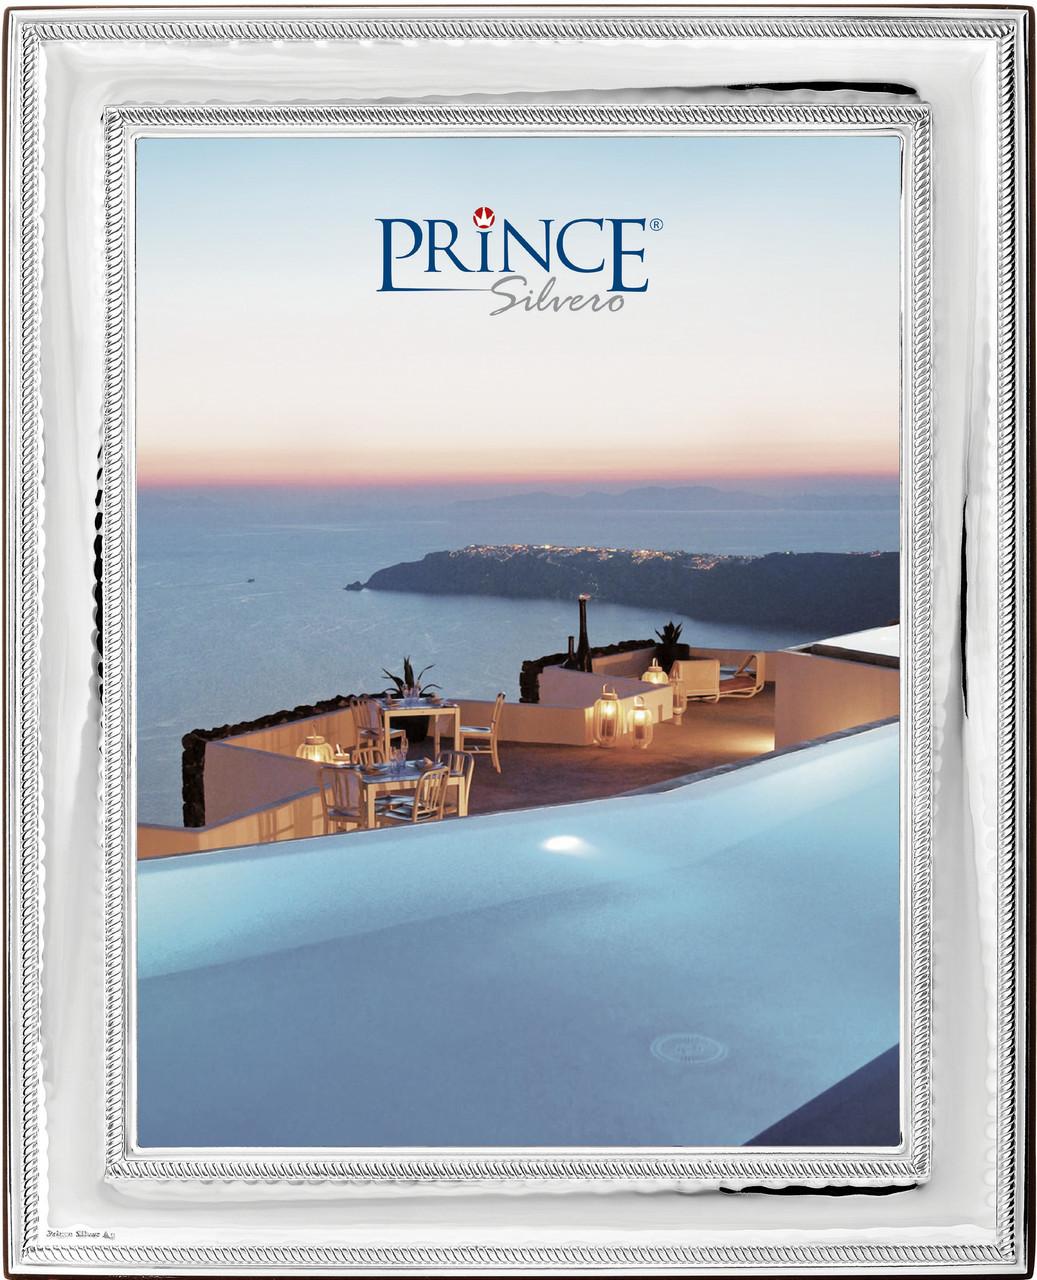 Серебряная рамка для фото Prince Silvreo